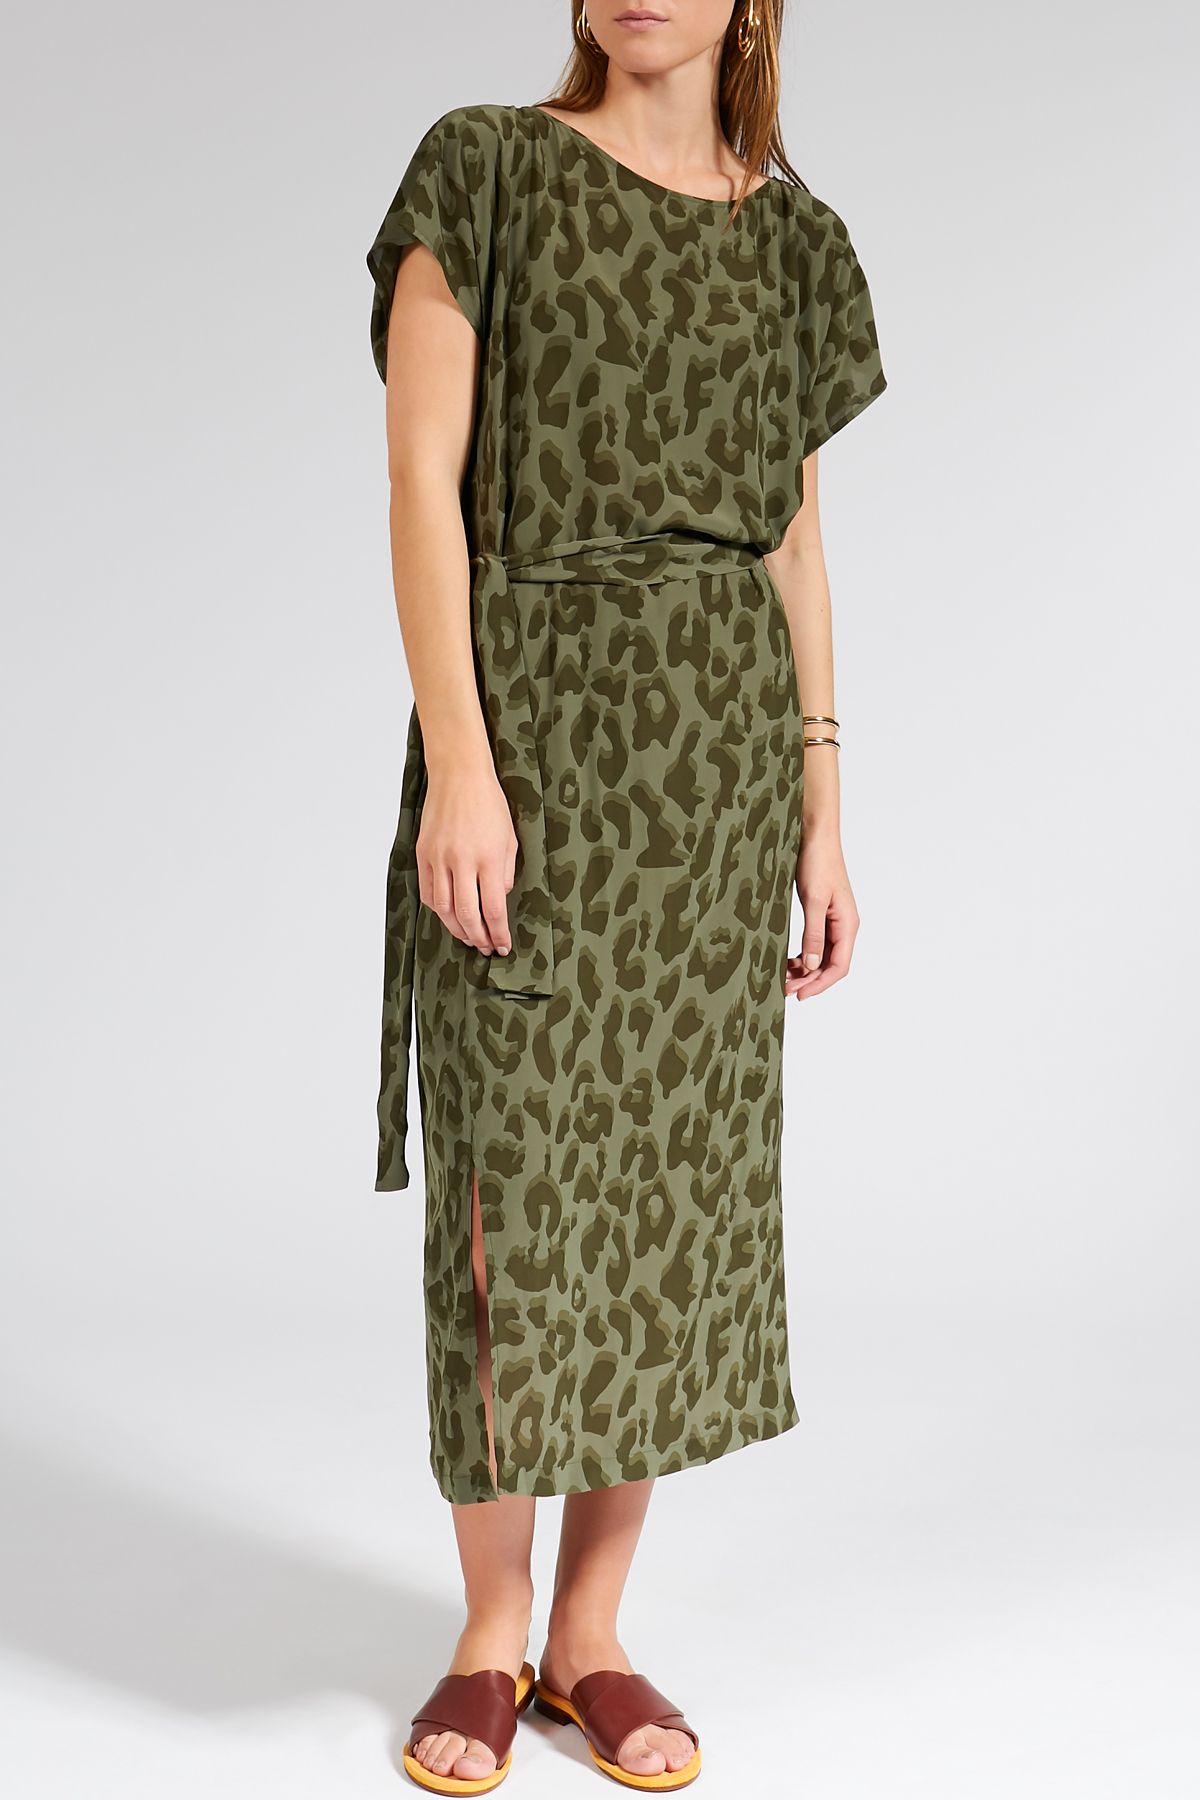 Midi-Kleid Odelia aus Viskose  Kleider, Outfit, Drykorn